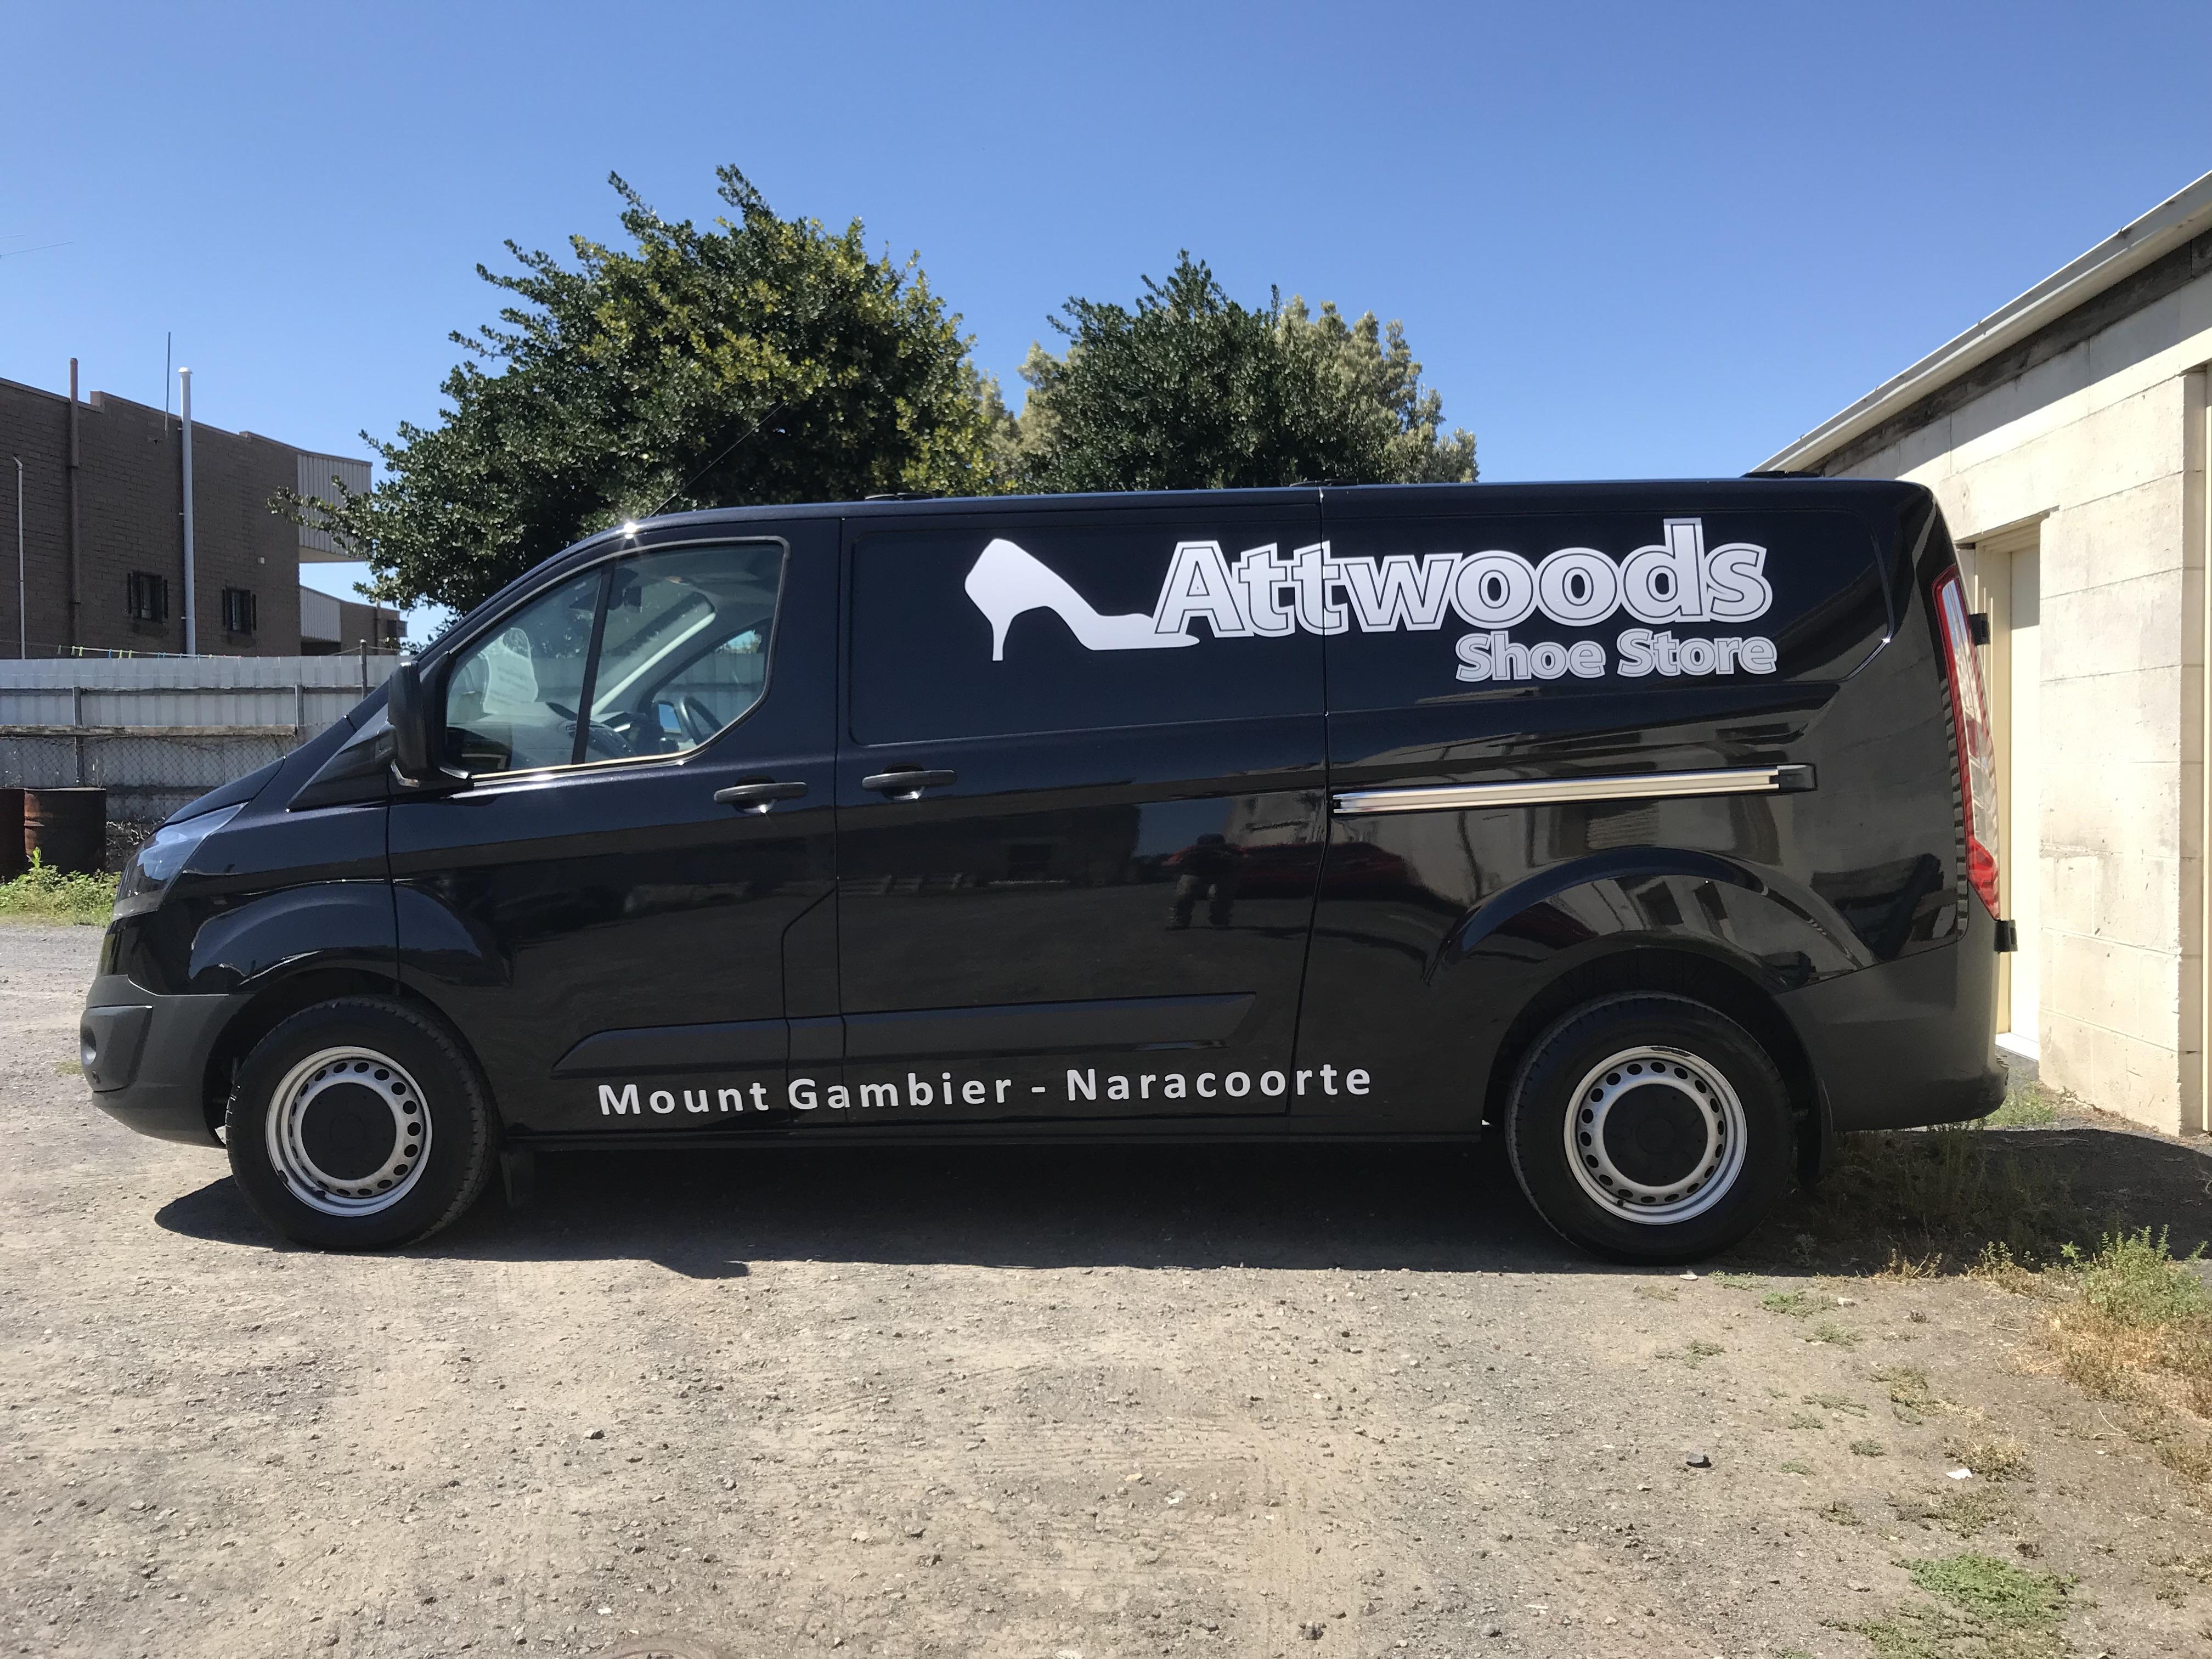 Attwood Shoes Van Signage